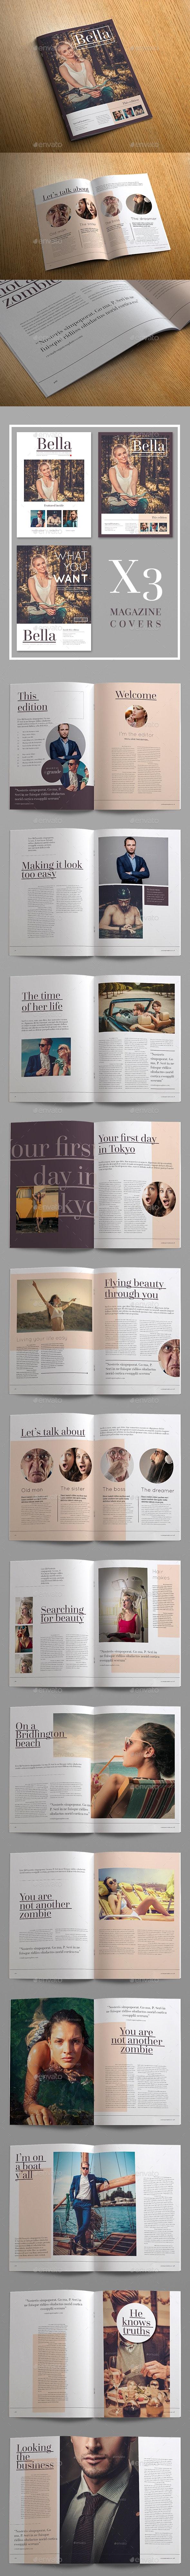 Bella Minimal Magazine Template - Magazines Print Templates